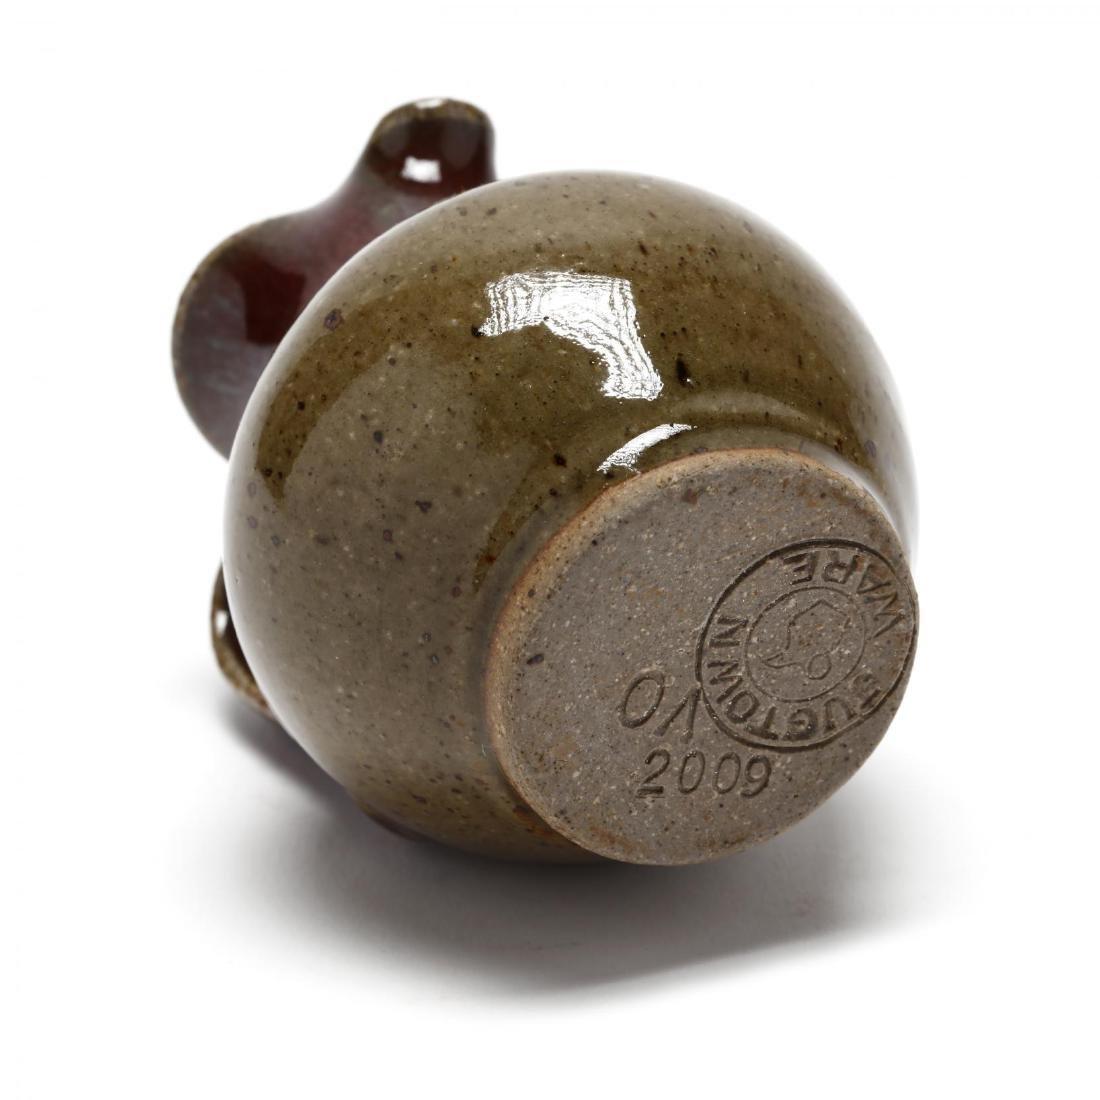 An Assortment of Jugtown Pottery - 5